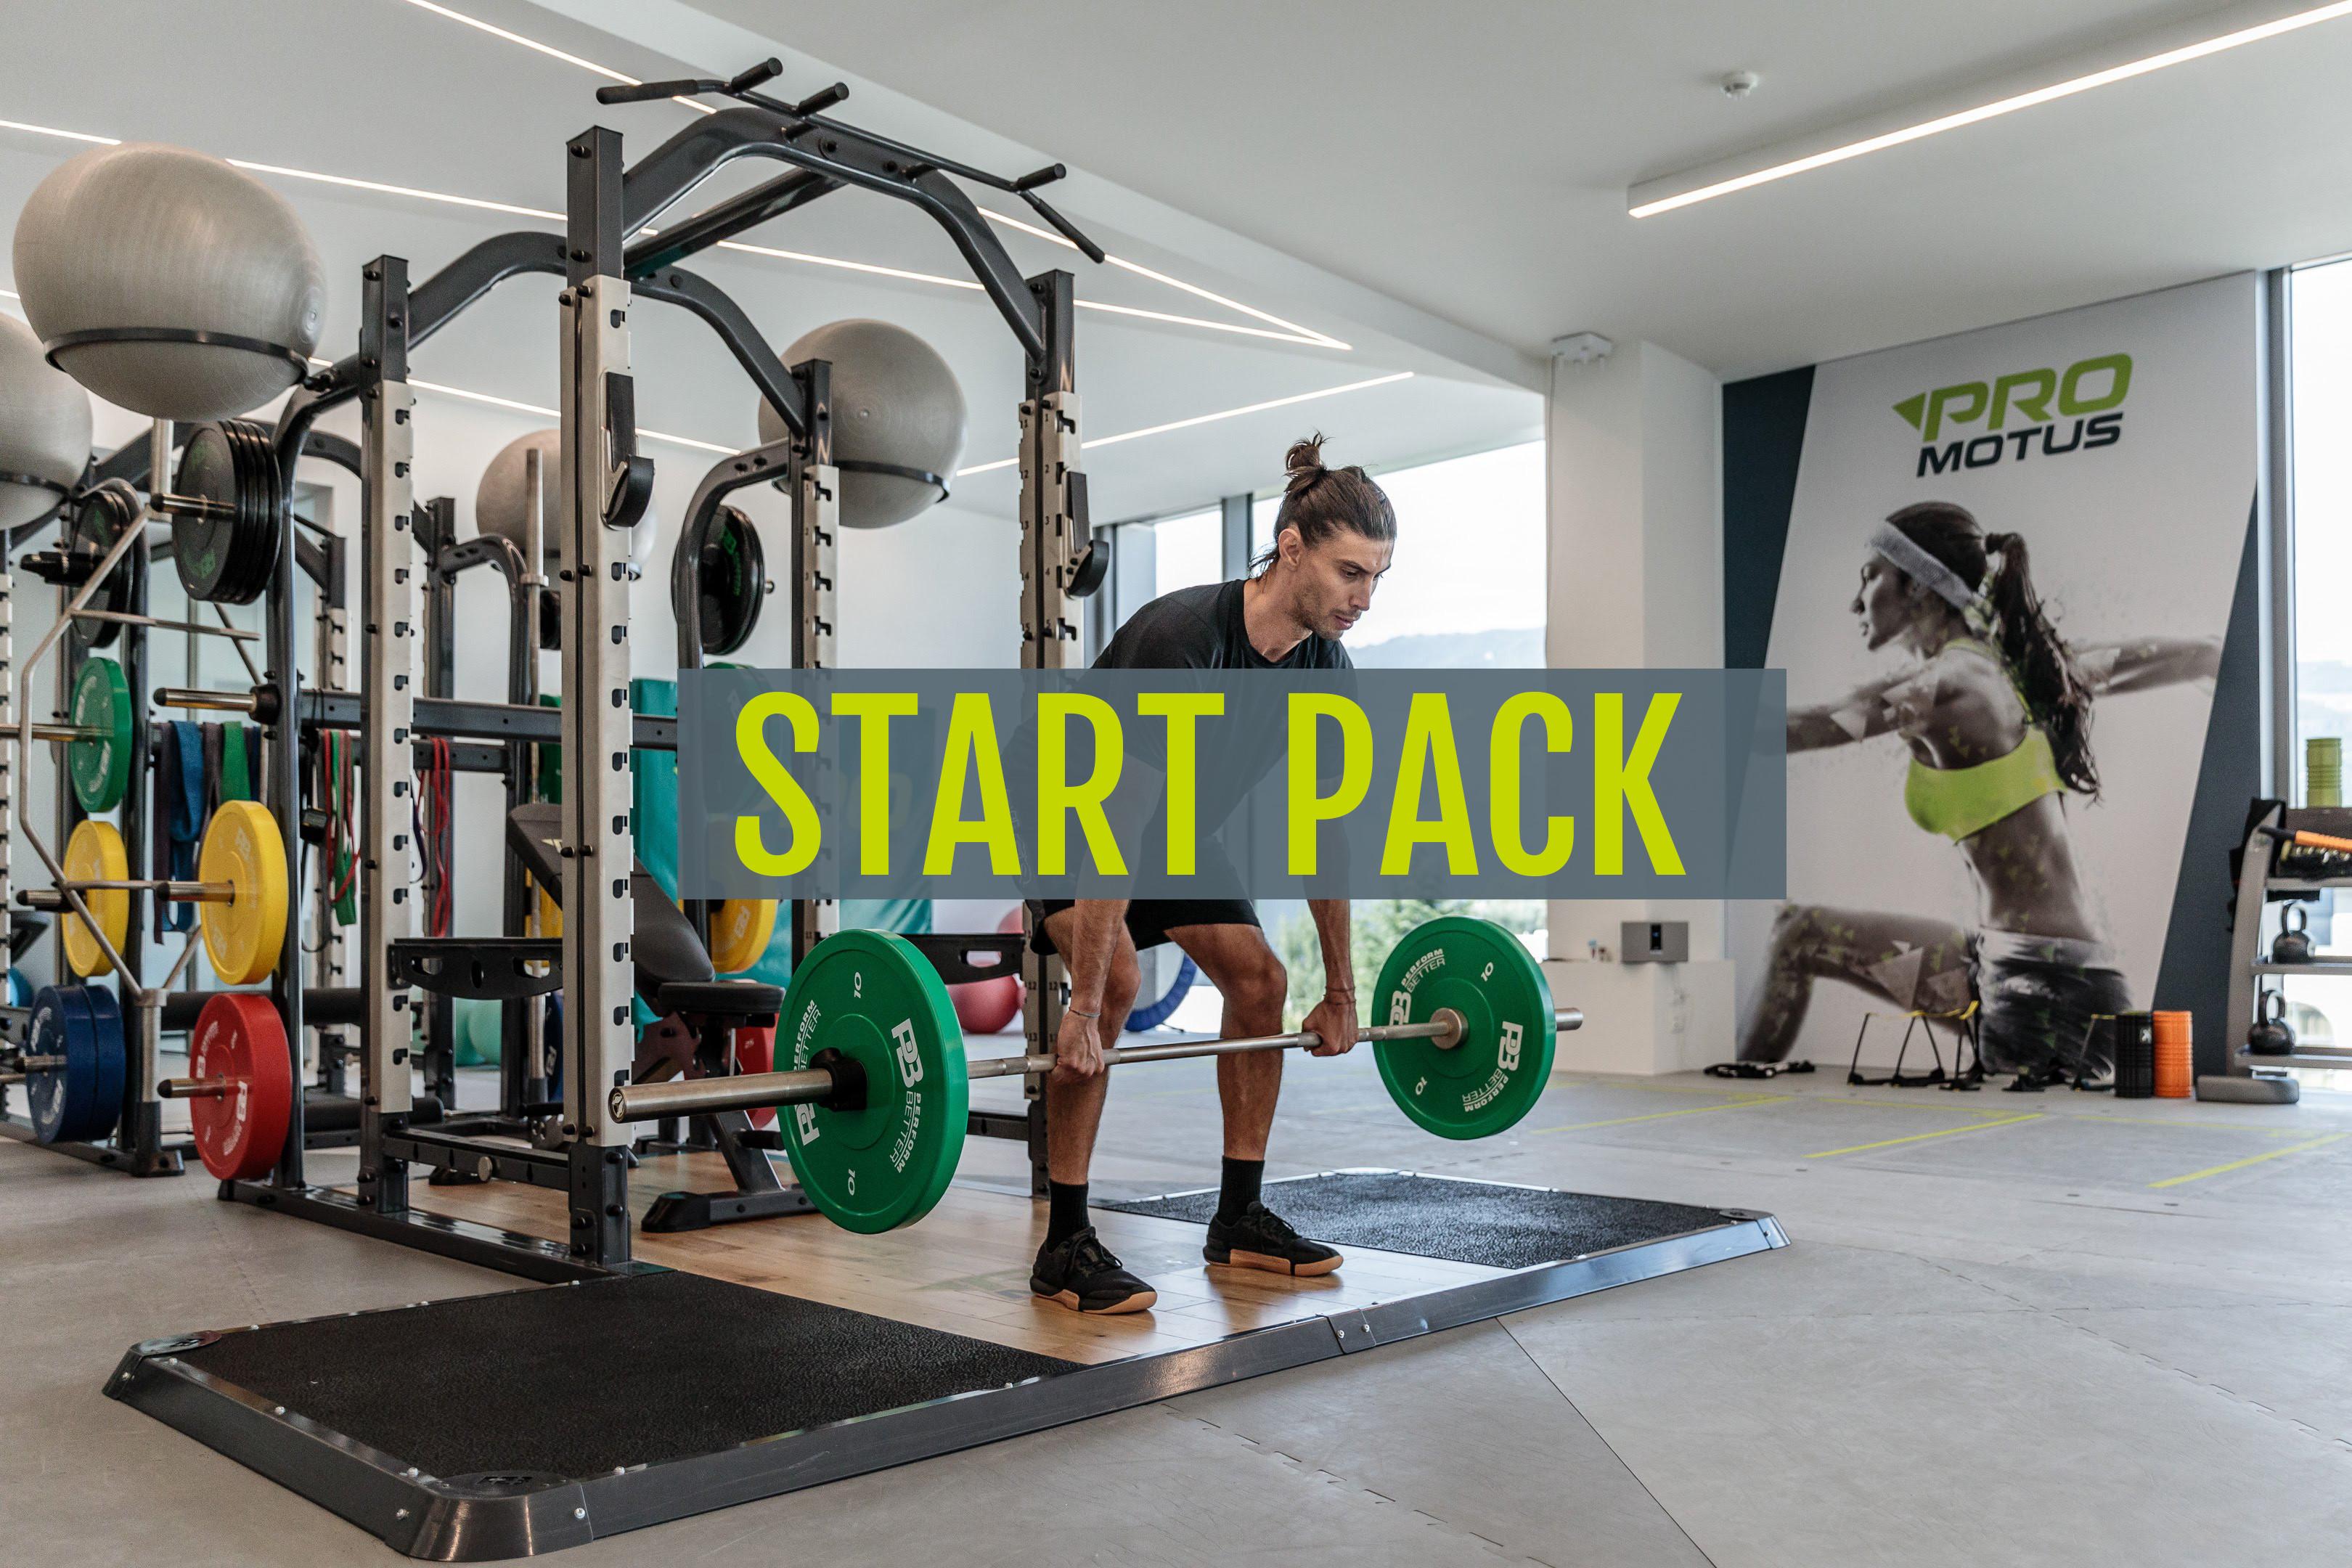 Snowboard - Start Pack